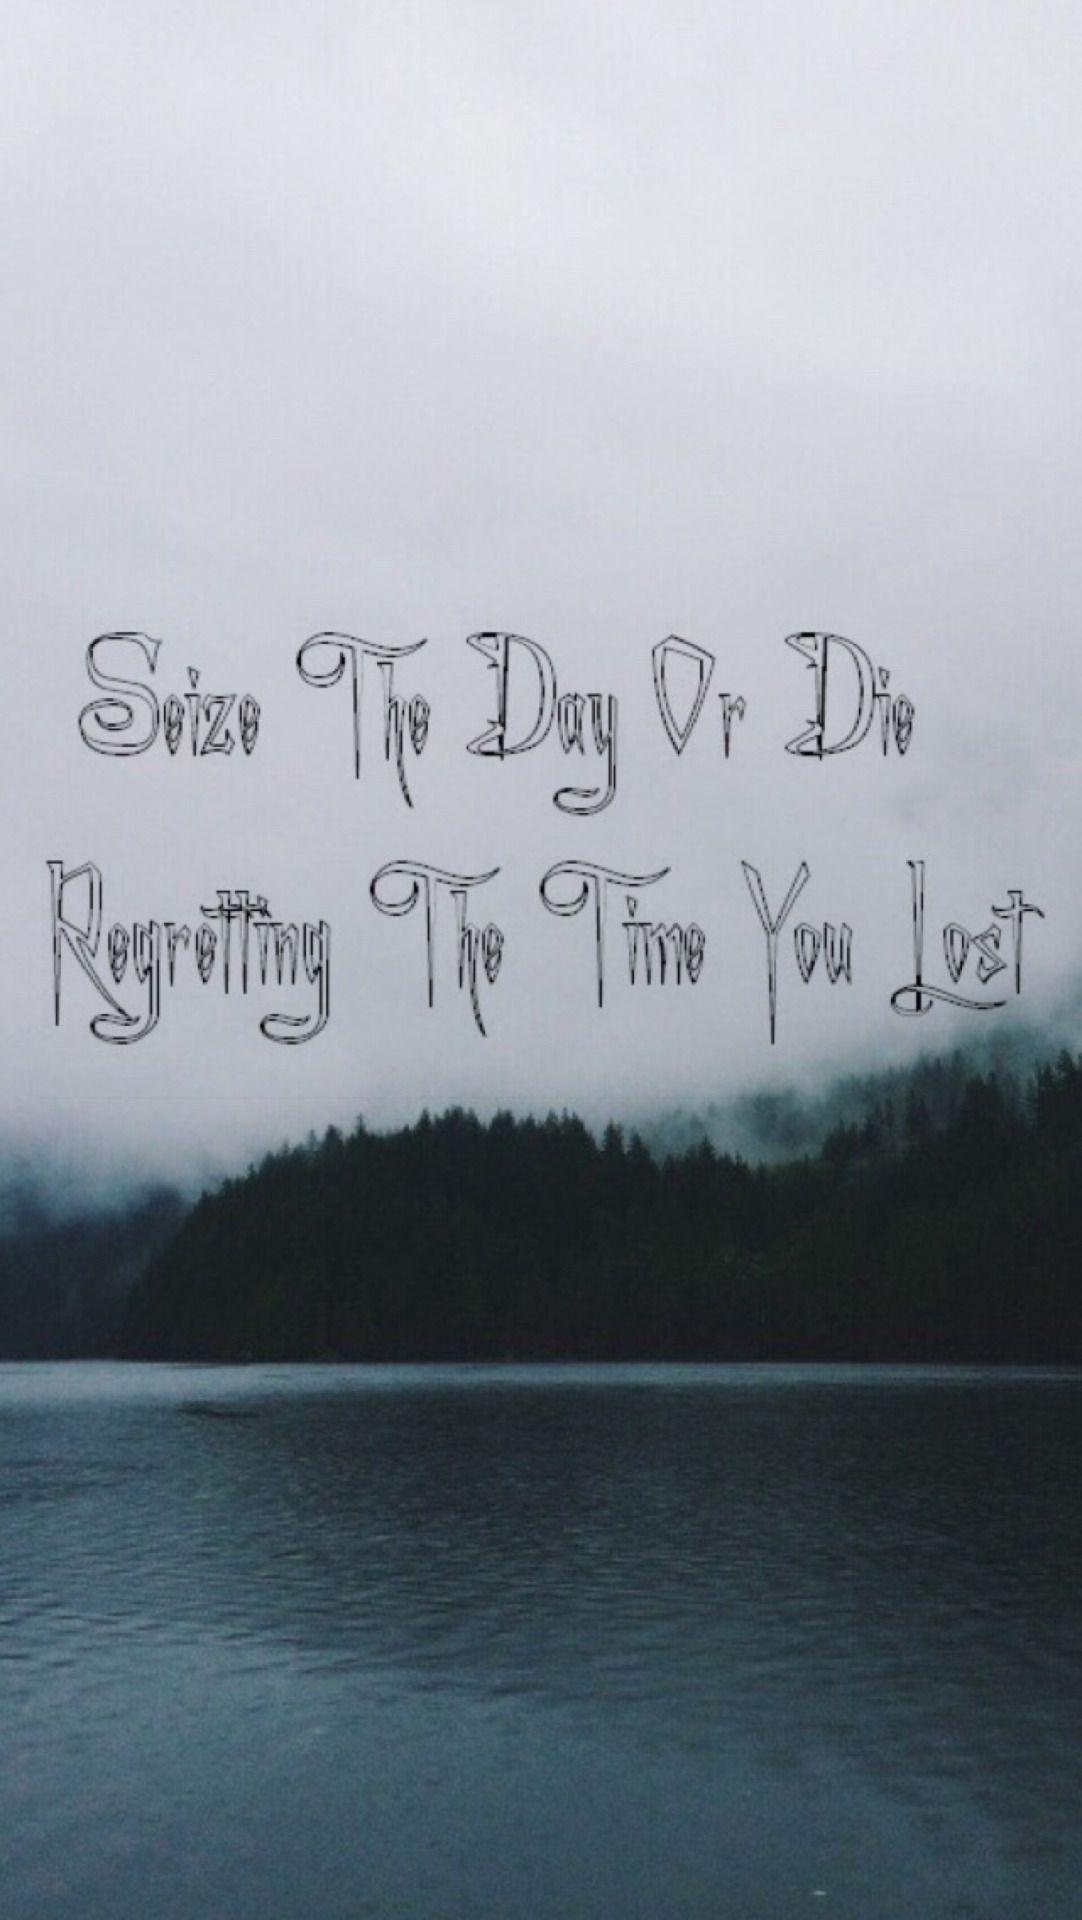 Avenged Sevenfold Lyrics Tattoos So Far Away Wwwimgkid